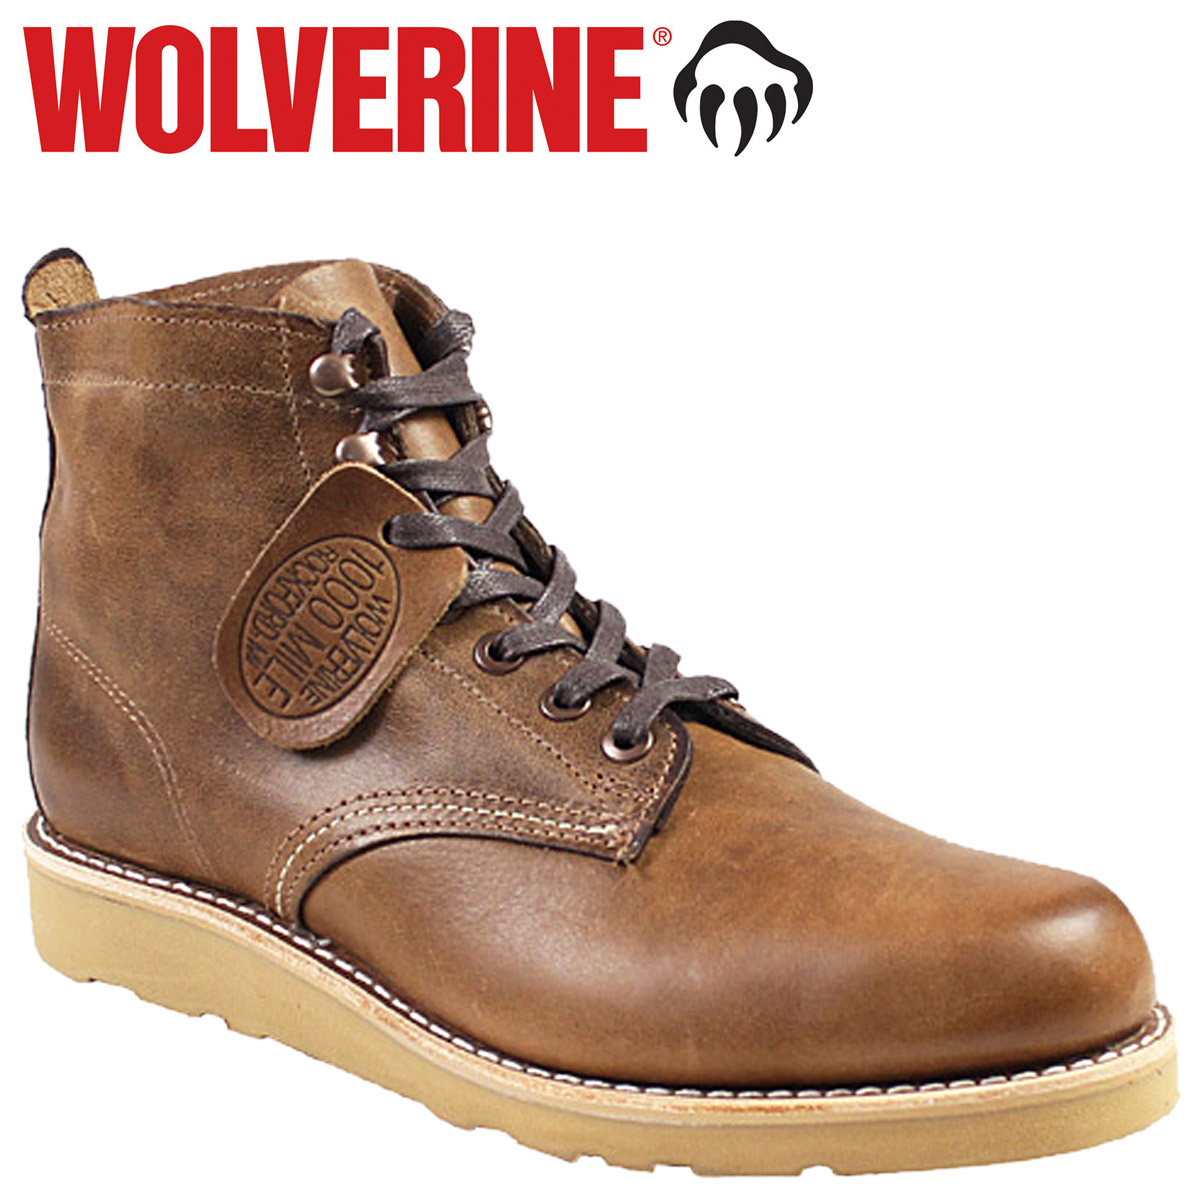 WOLVERINE 1000マイル ブーツ ウルヴァリン 1000MILE PRESTWICK WEDGE BOOT Dワイズ W00915 ブラウン ワークブーツ